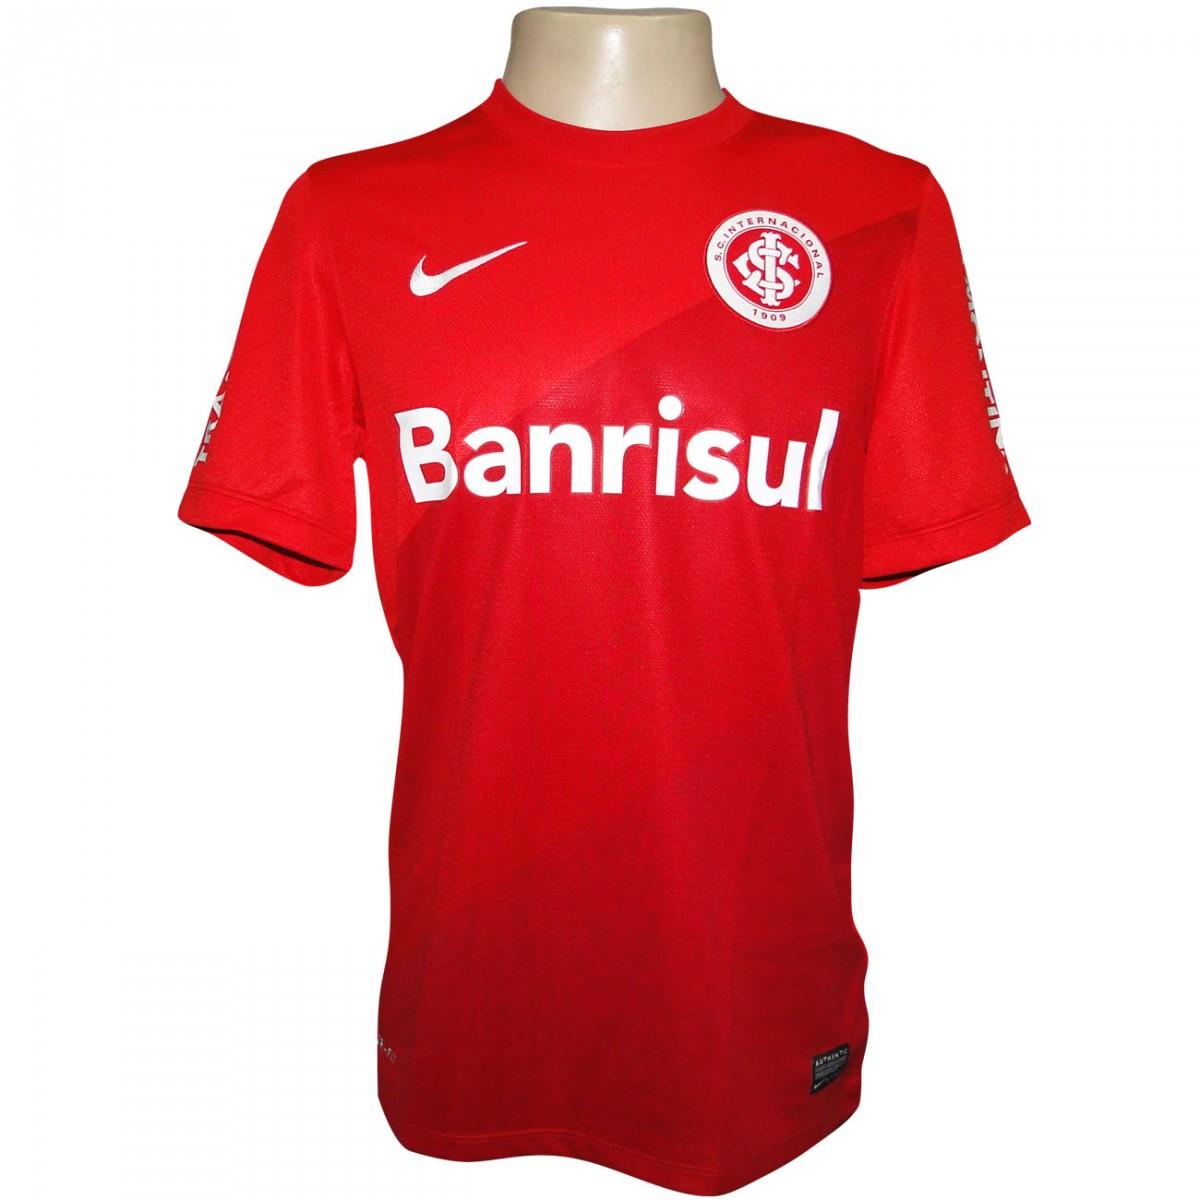 Camisa Inter Nike 2013 2014 544794 612 - Vermelho Branco - Chuteira Nike d3cf2393b7039